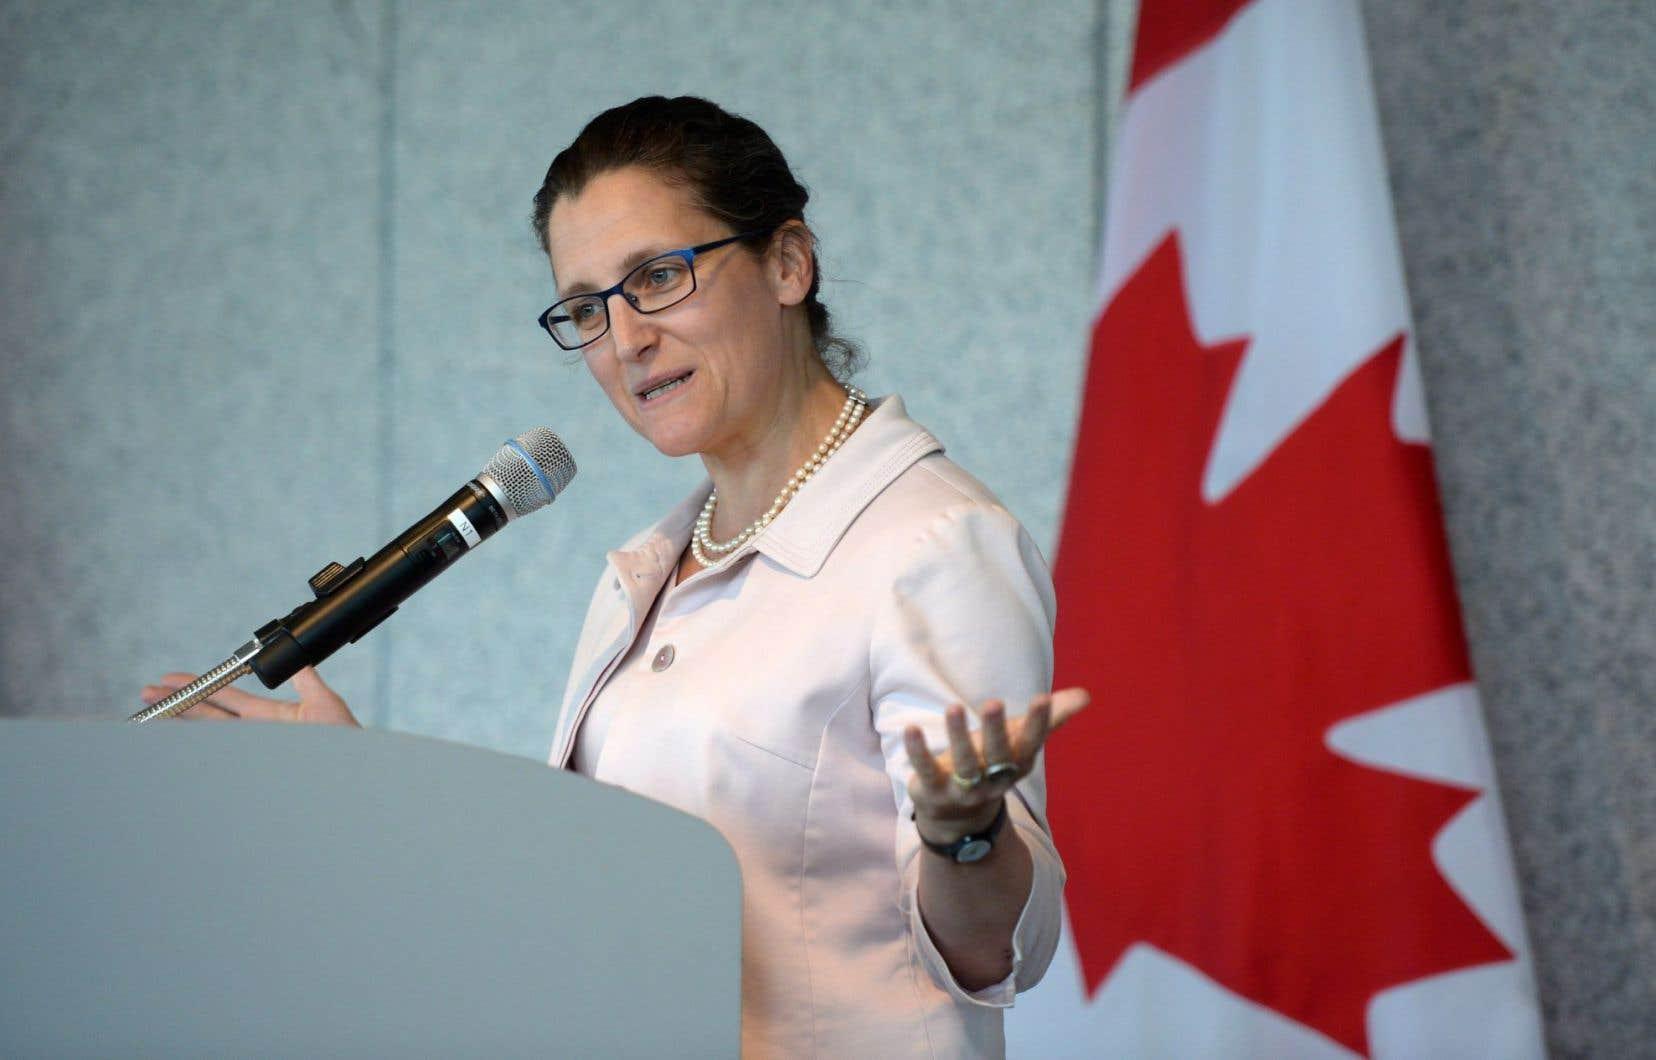 La ministre canadienne du Commerce international, Chrystia Freeland